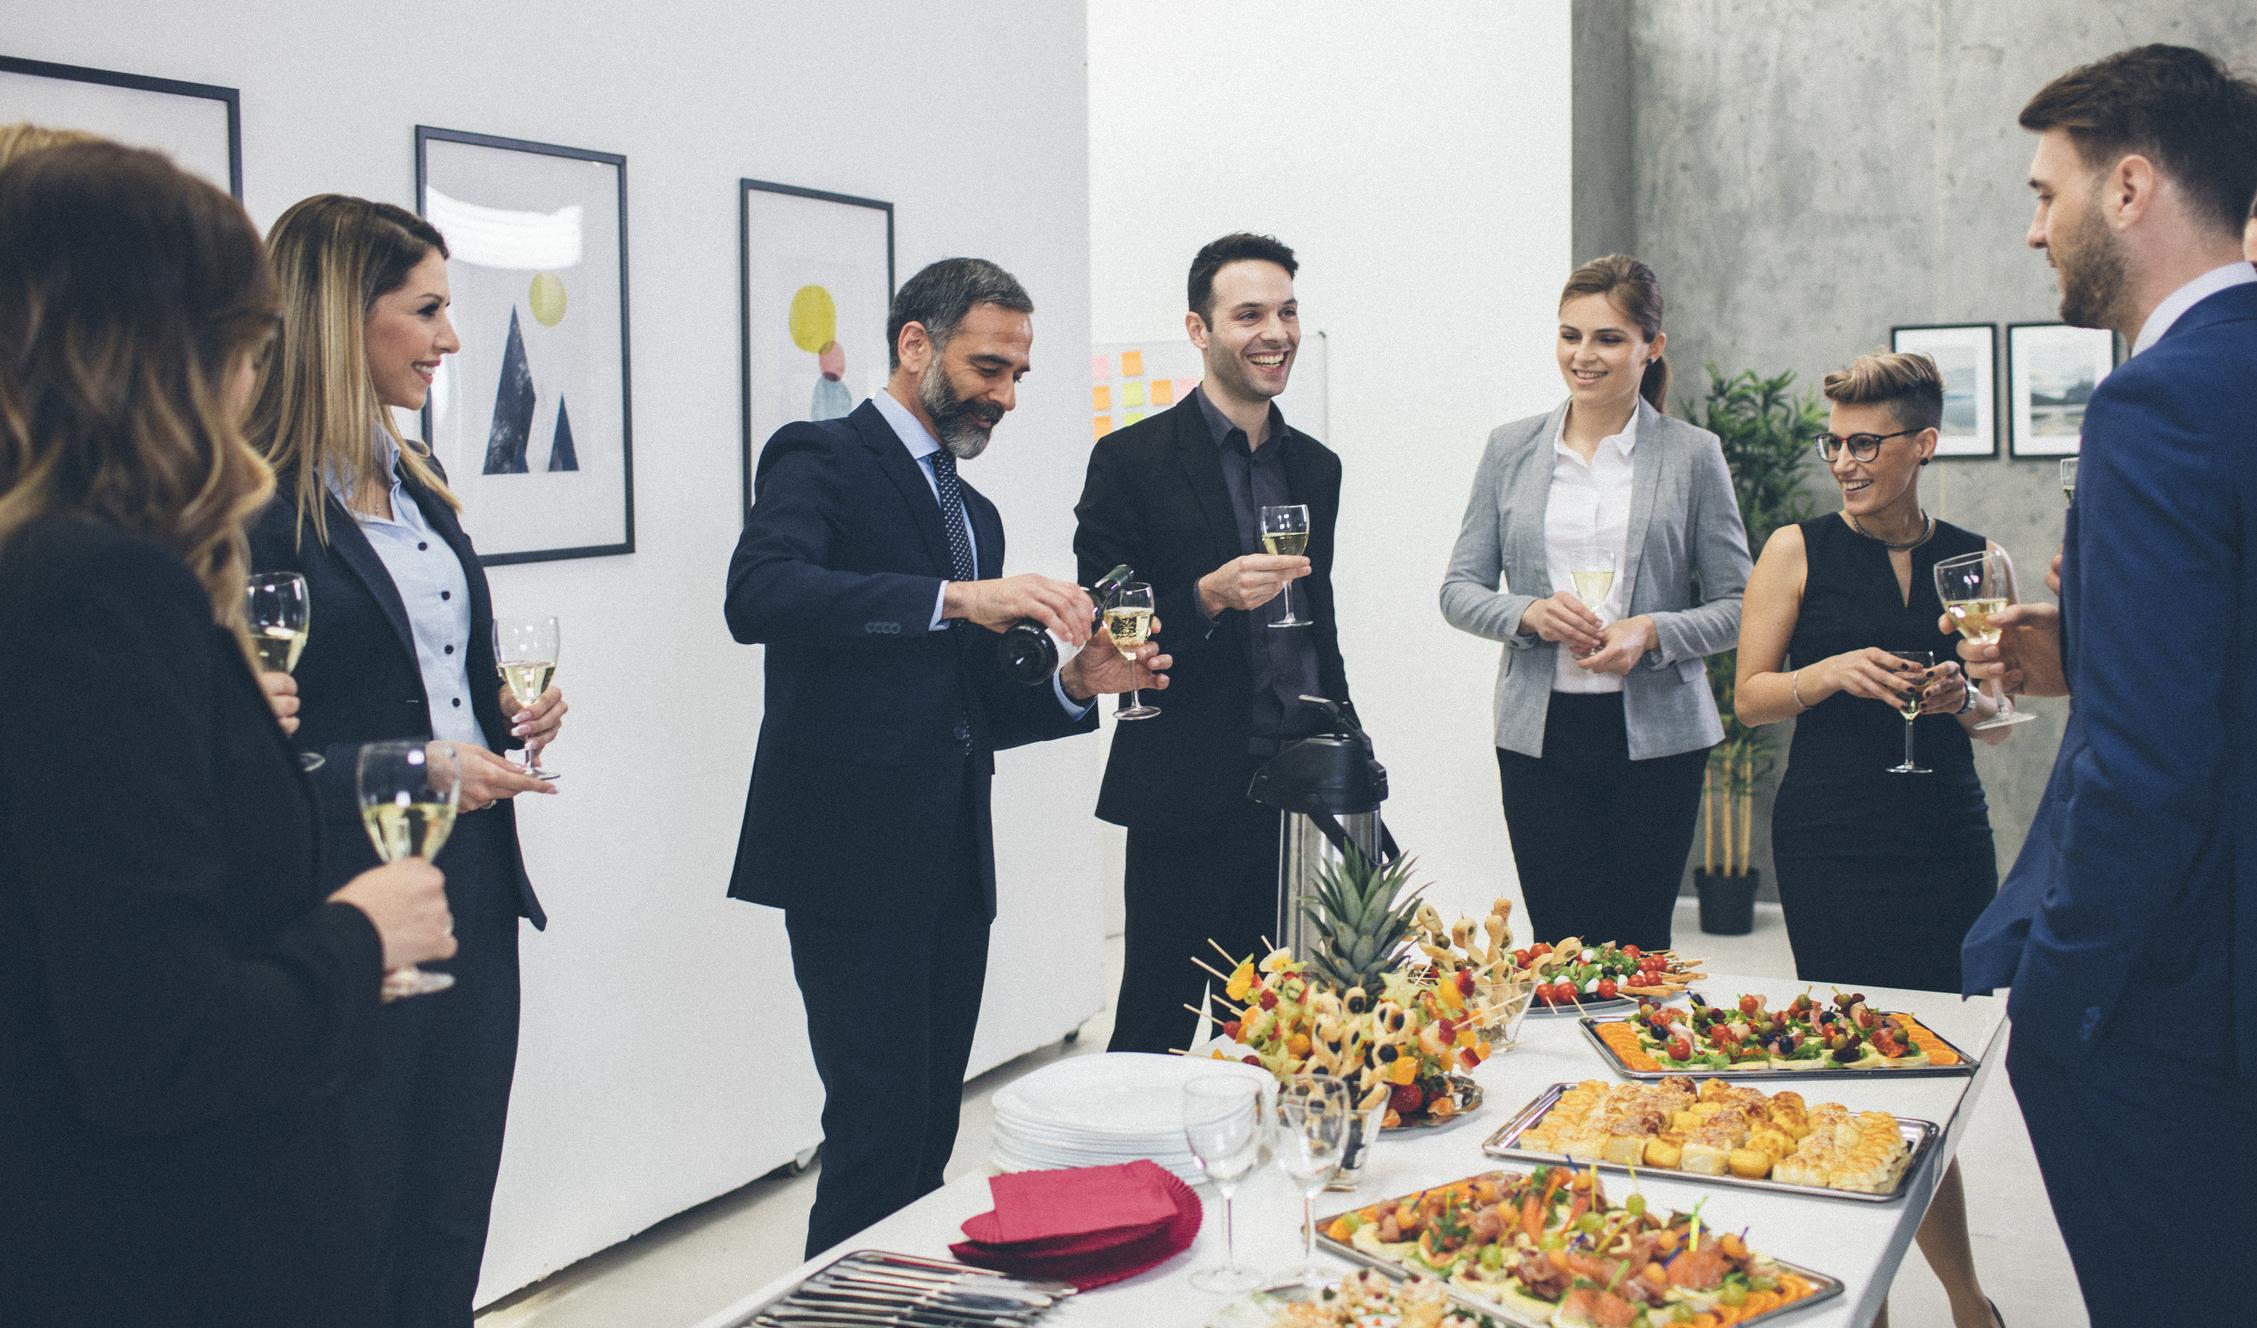 business-buffet-people-conversing